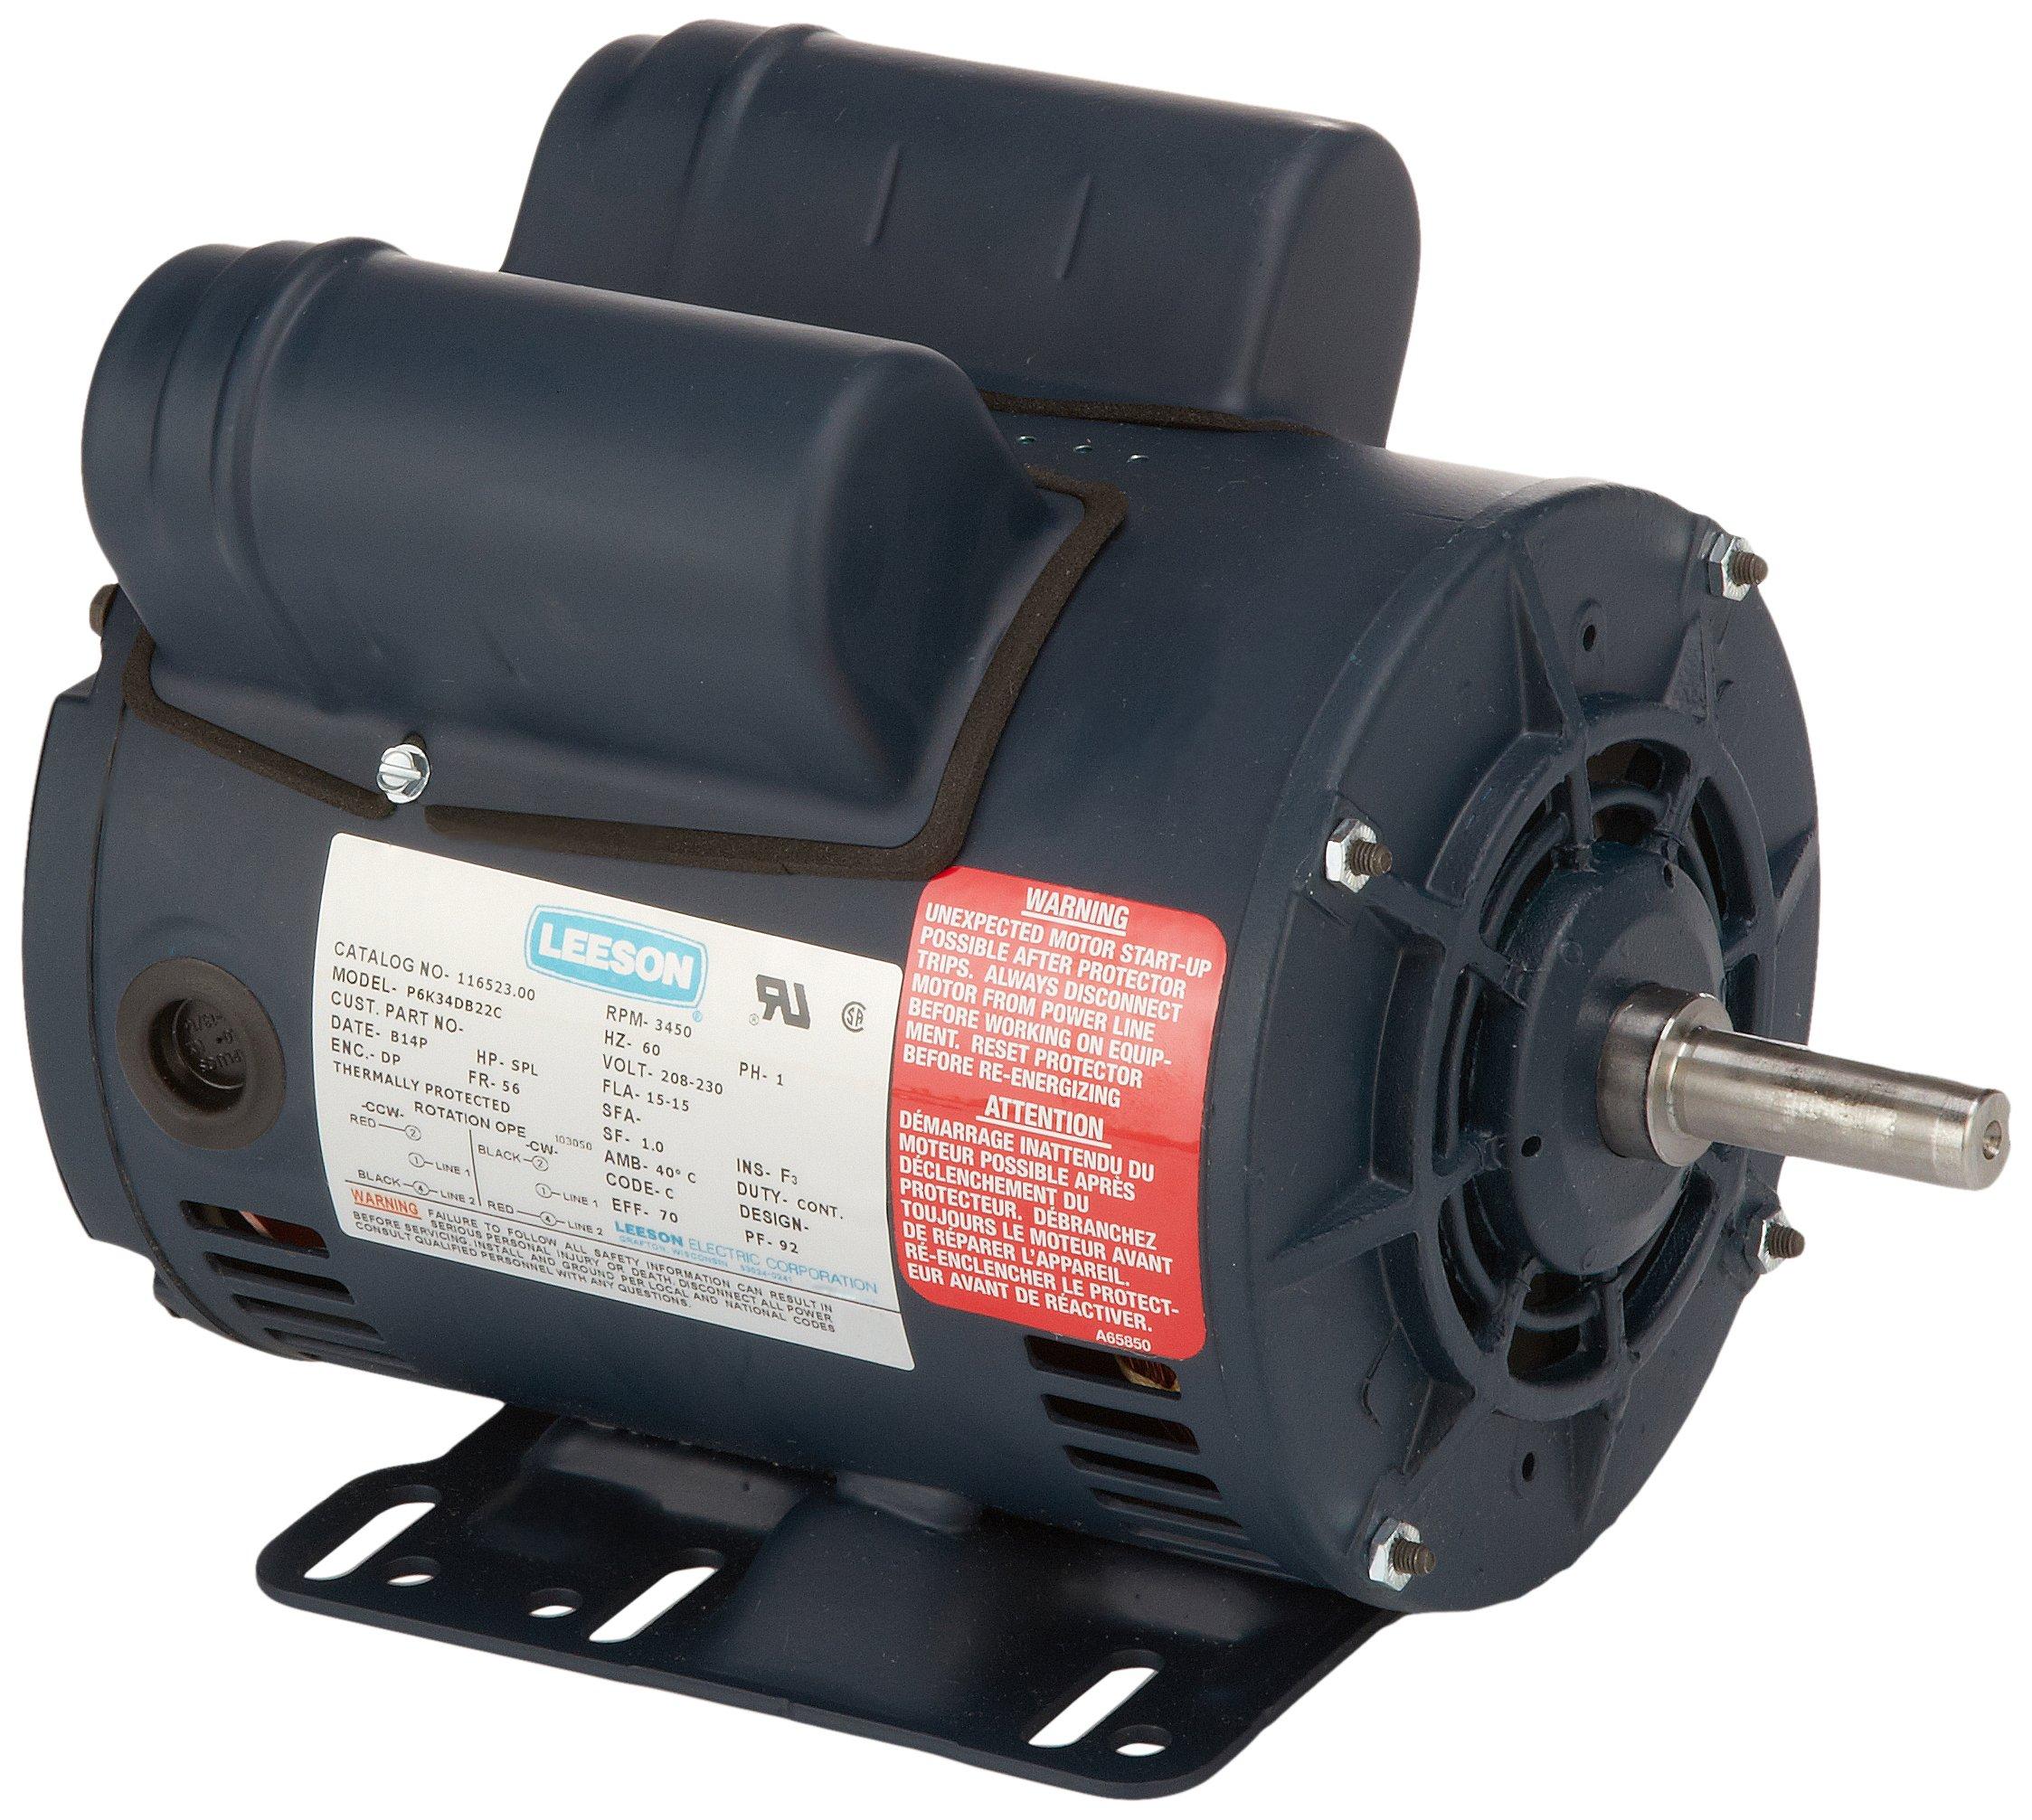 Leeson 116523.00 Compressor Duty ODP Motor, 1 Phase, 56 Frame, Rigid Mounting, 5SPLHP, 3600 RPM, 208-230V Voltage, 60Hz Fequency